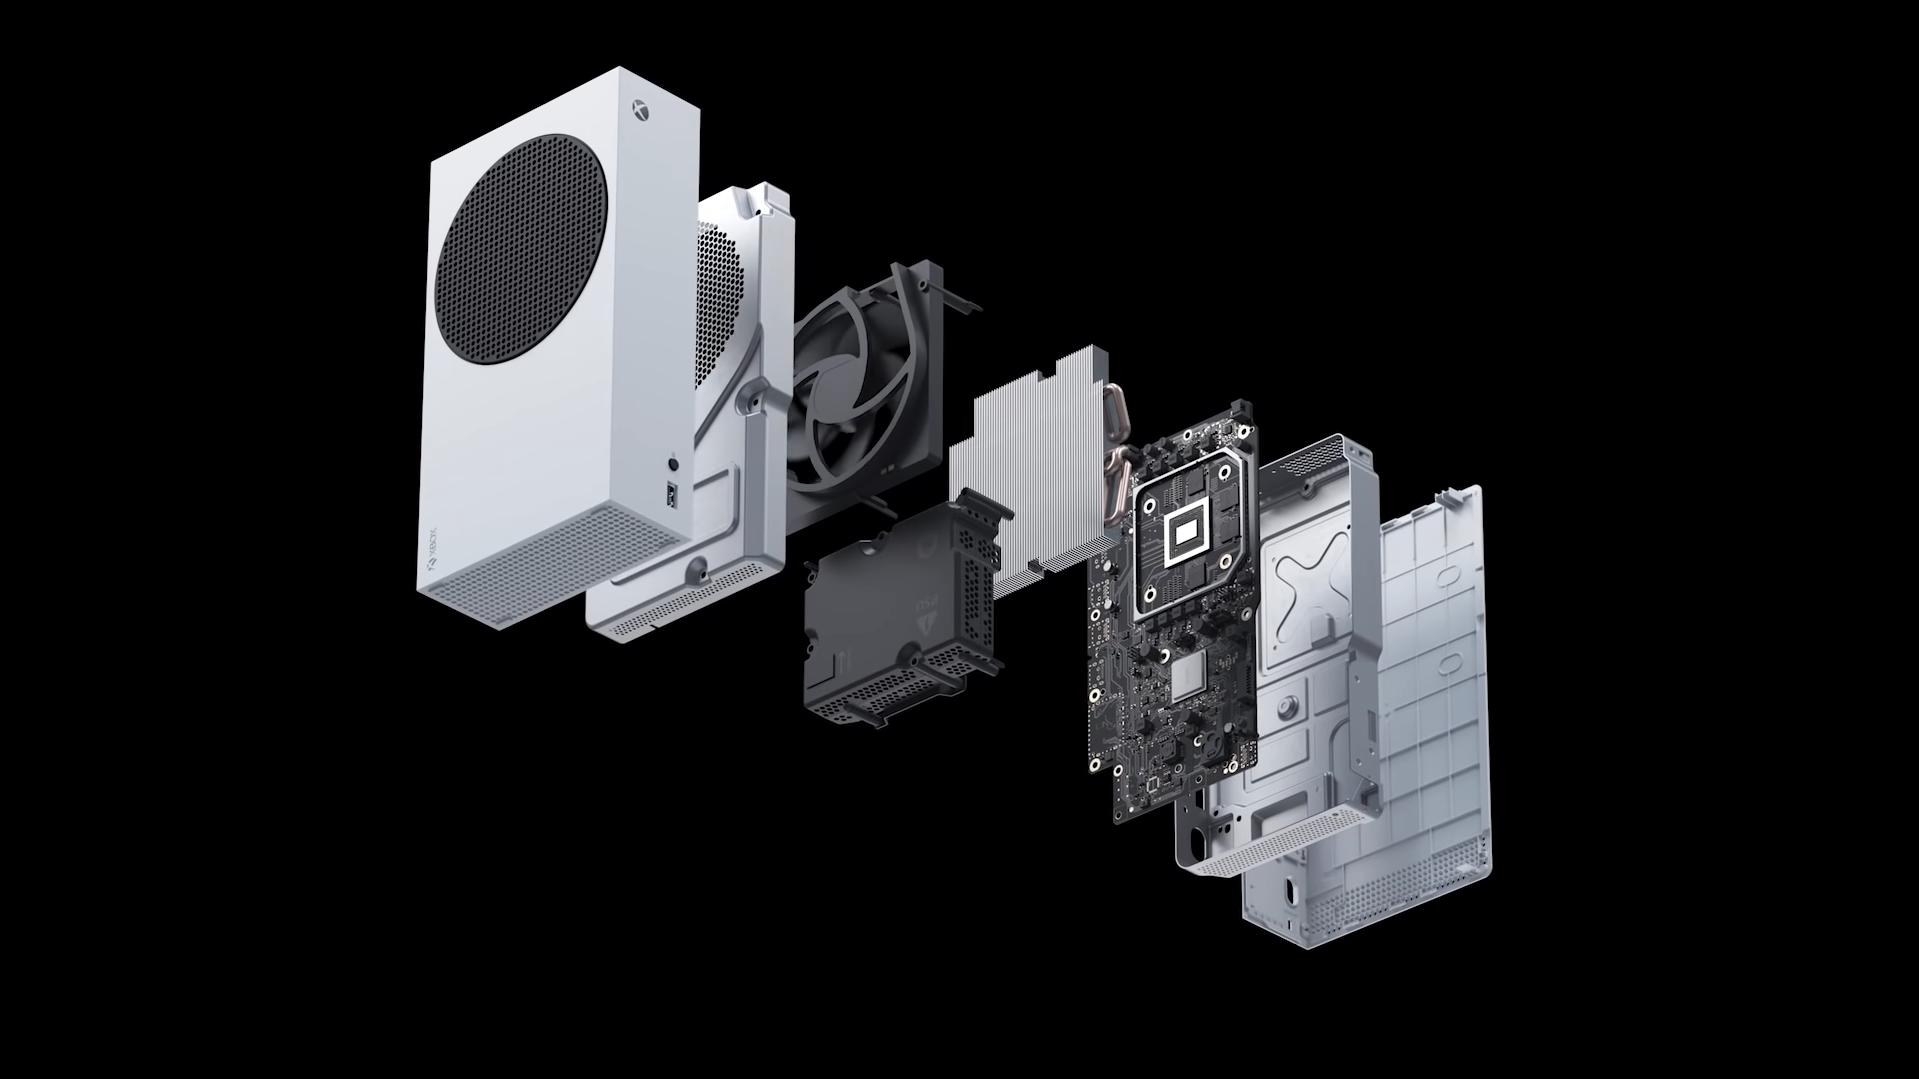 Внутри Xbox Series S: главные особенности и отличия от Xbox Series X